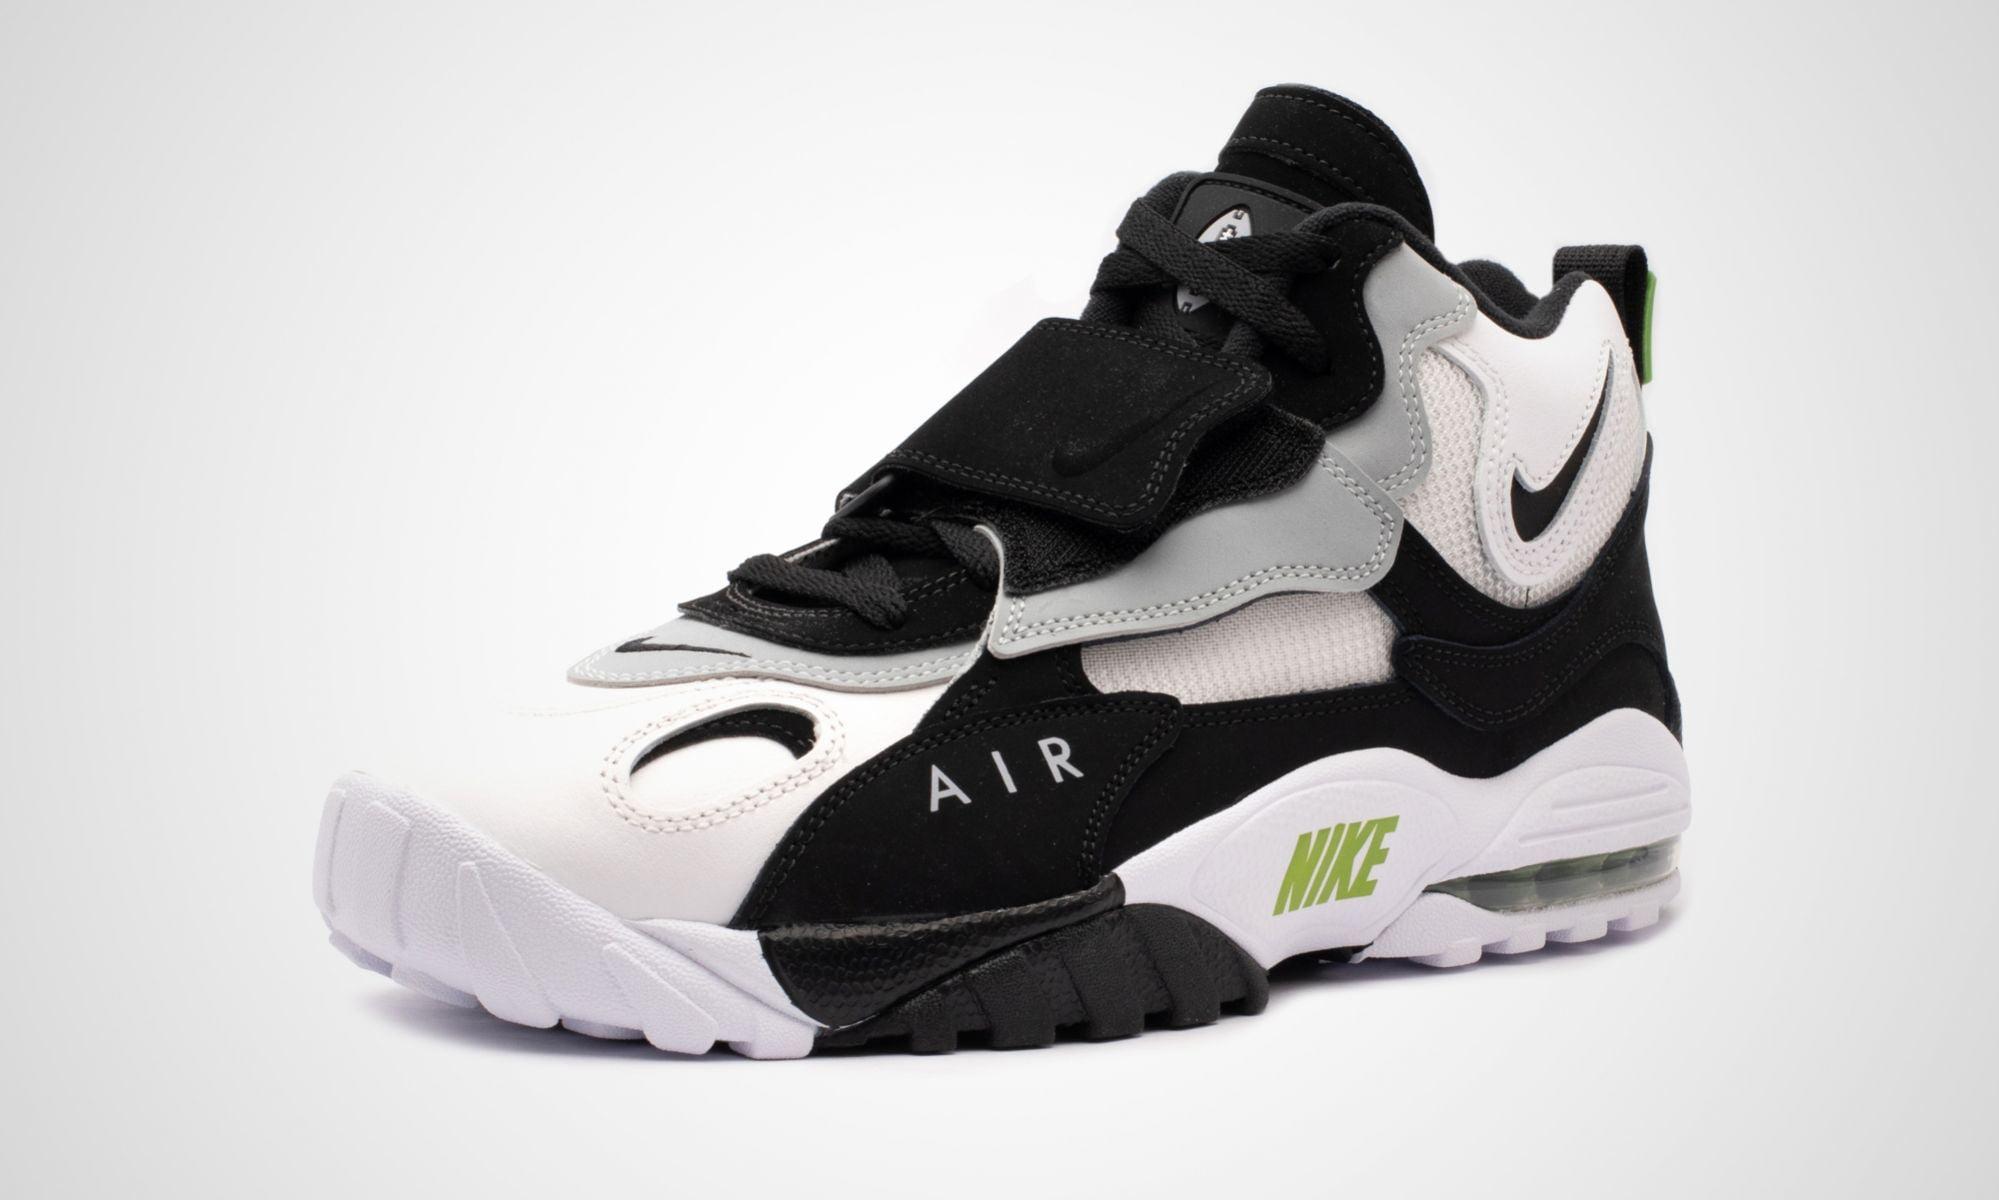 info for 2e71d eab75 germany purple black mens nike air speed turf shoes e8bb8 15309